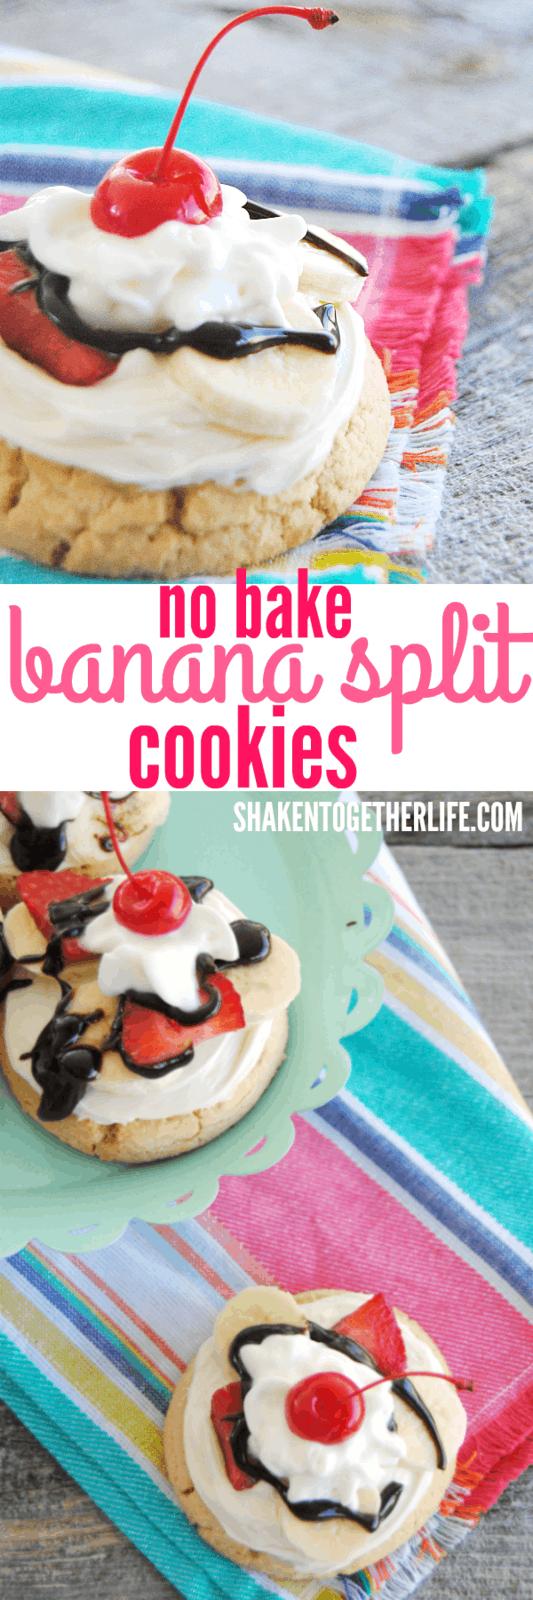 Banana Split Cookies - the ultimate easy no-bake dessert!